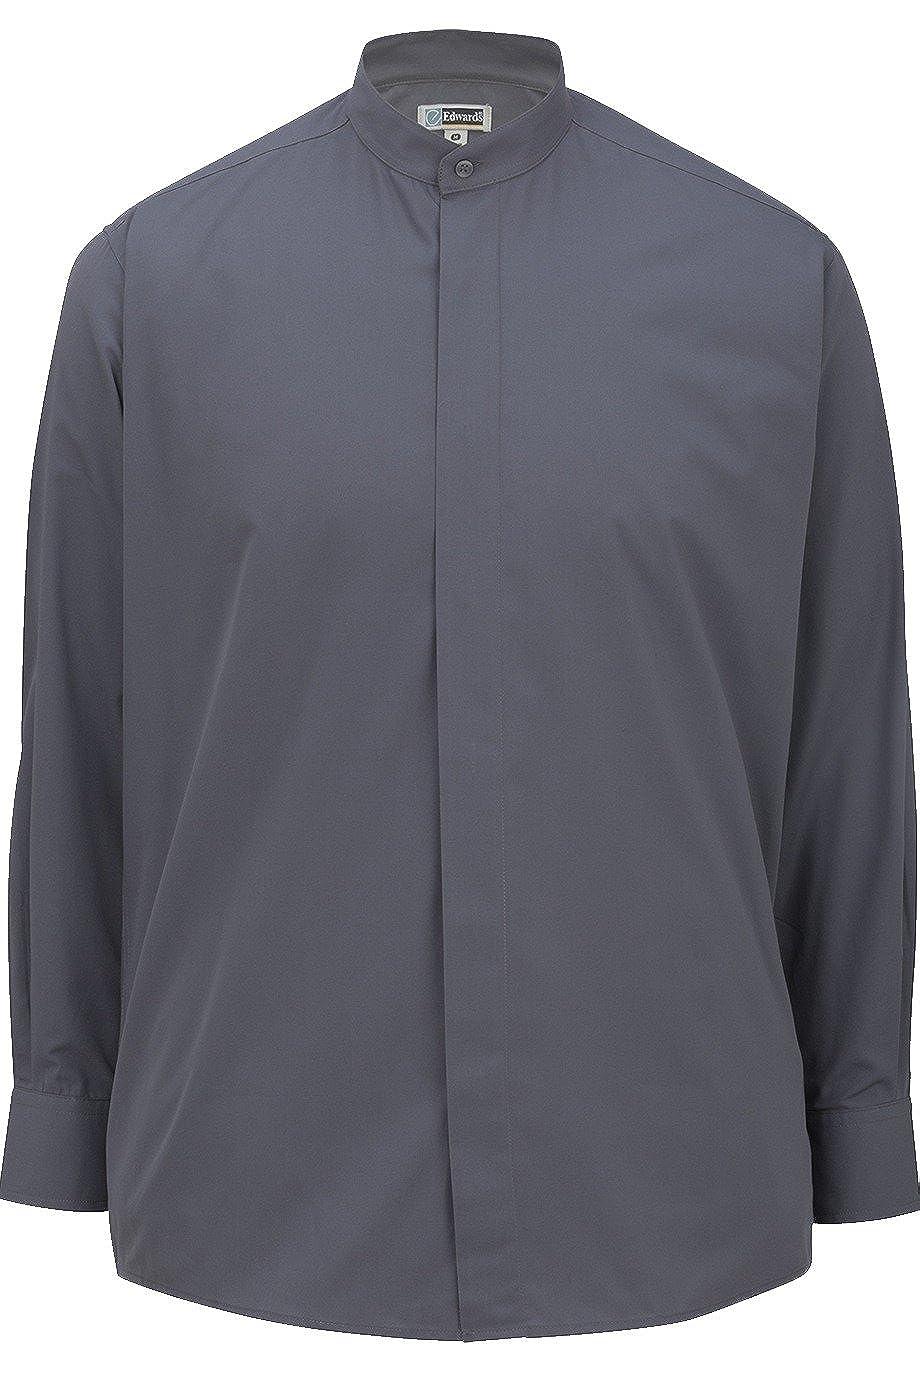 Elliesox Mens Banded Collar Long Sleeve Shirt by Edwards 1396